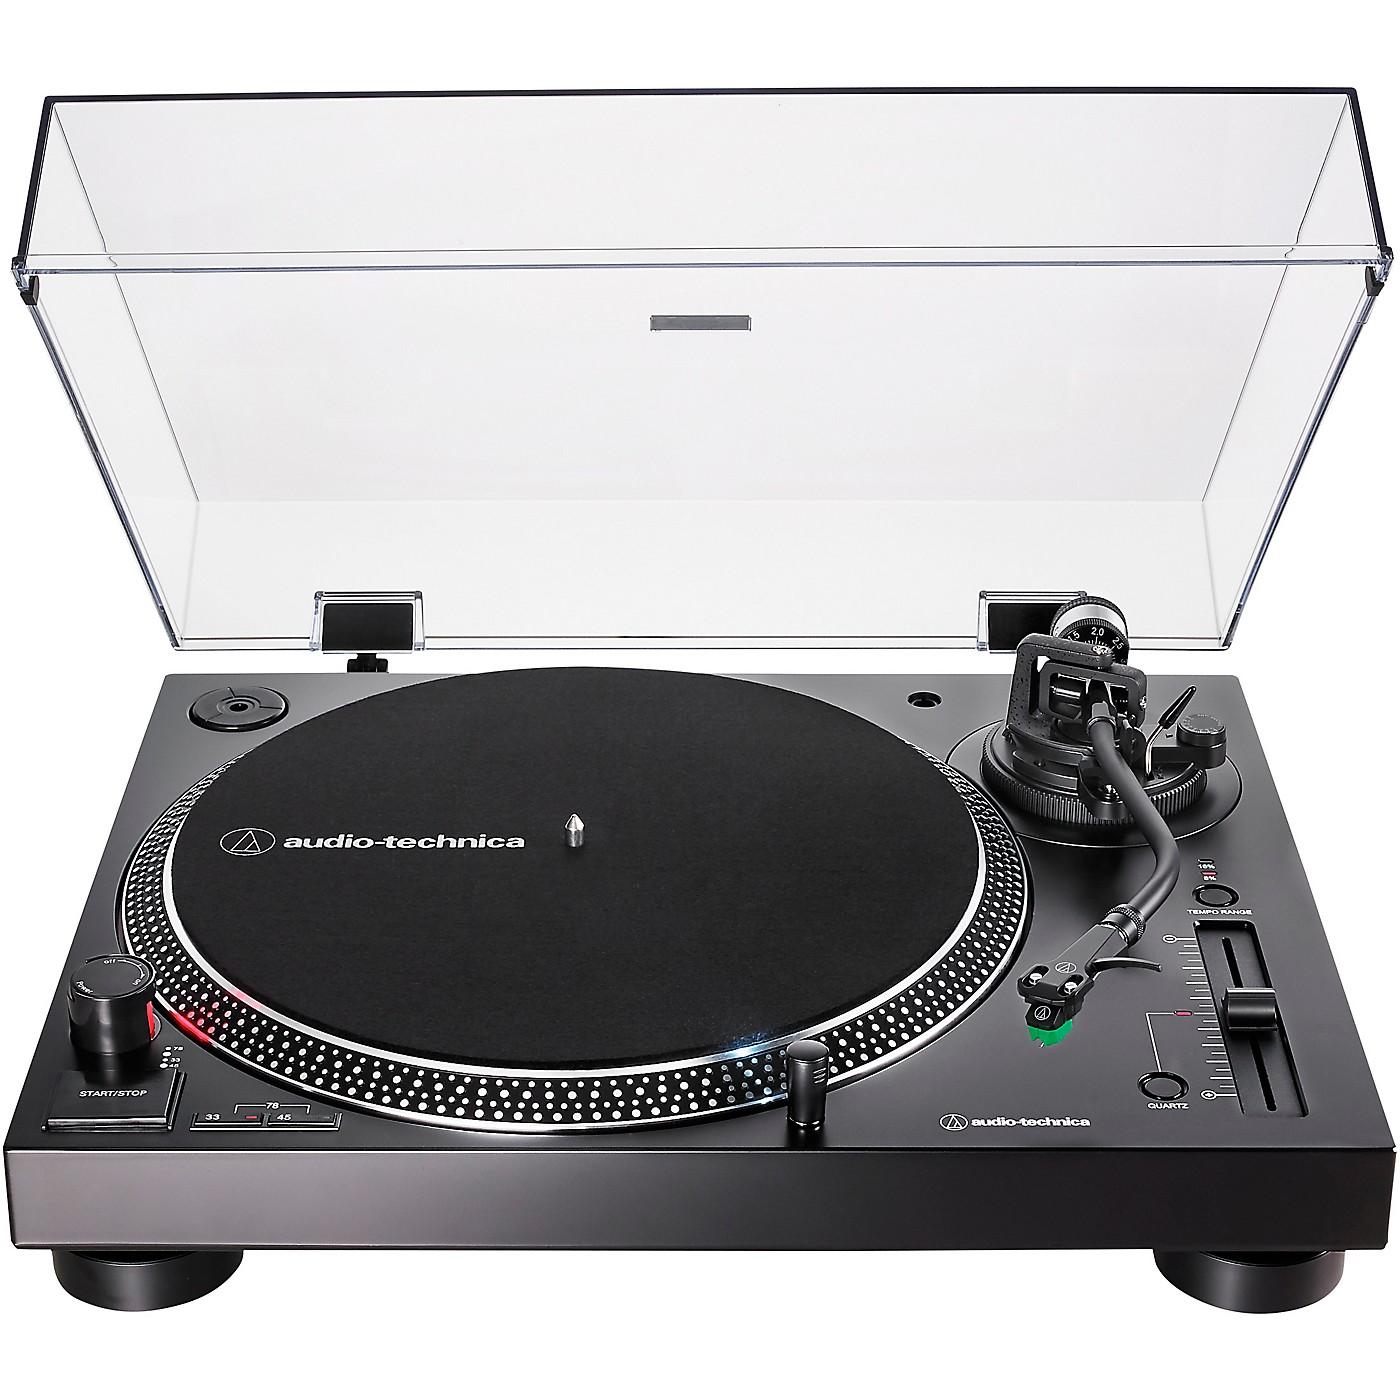 Audio-Technica AT-LP120XUSB Direct-Drive Professional Record Player (USB & Analog) thumbnail